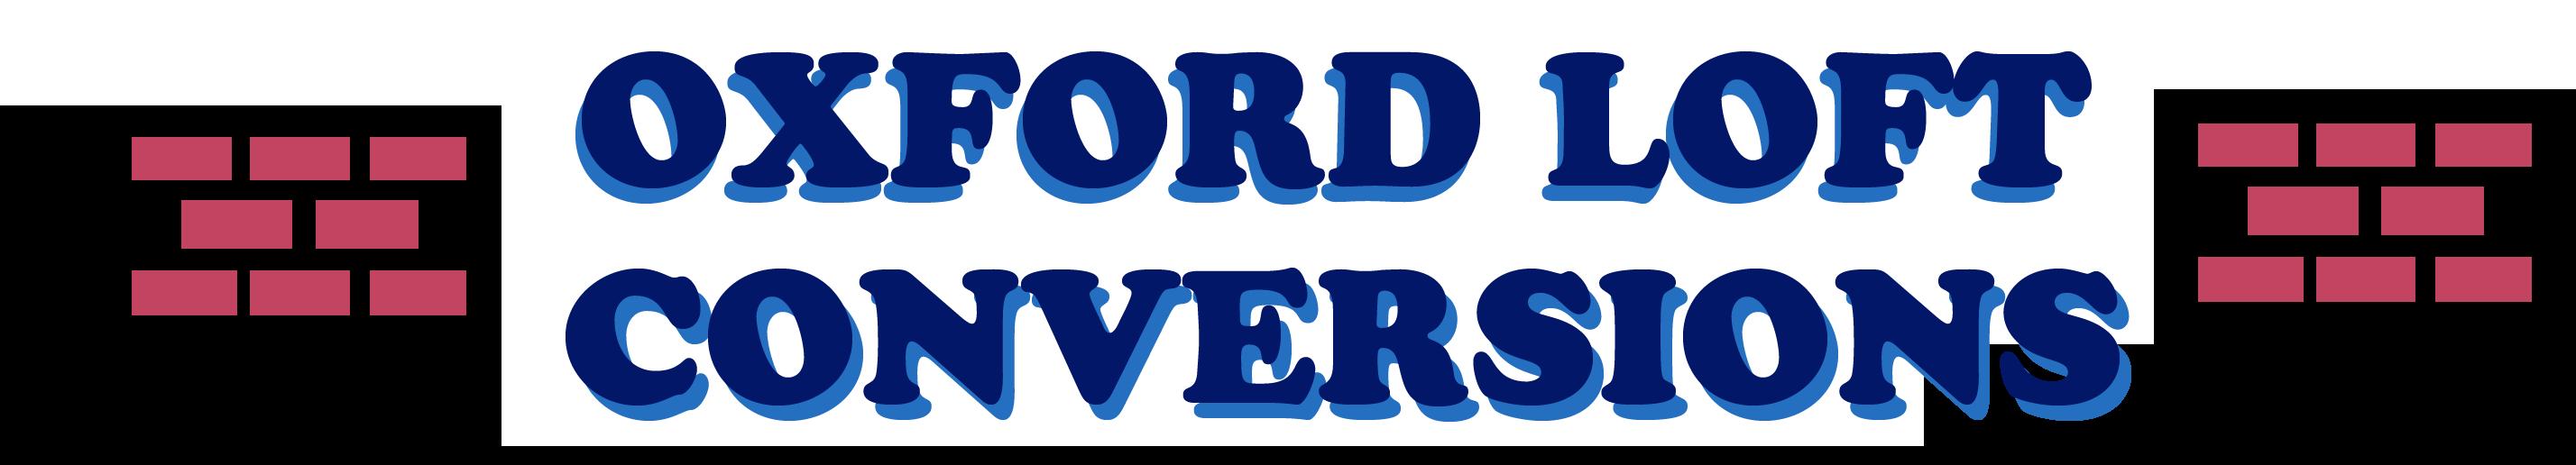 Oxford Loft Conversions